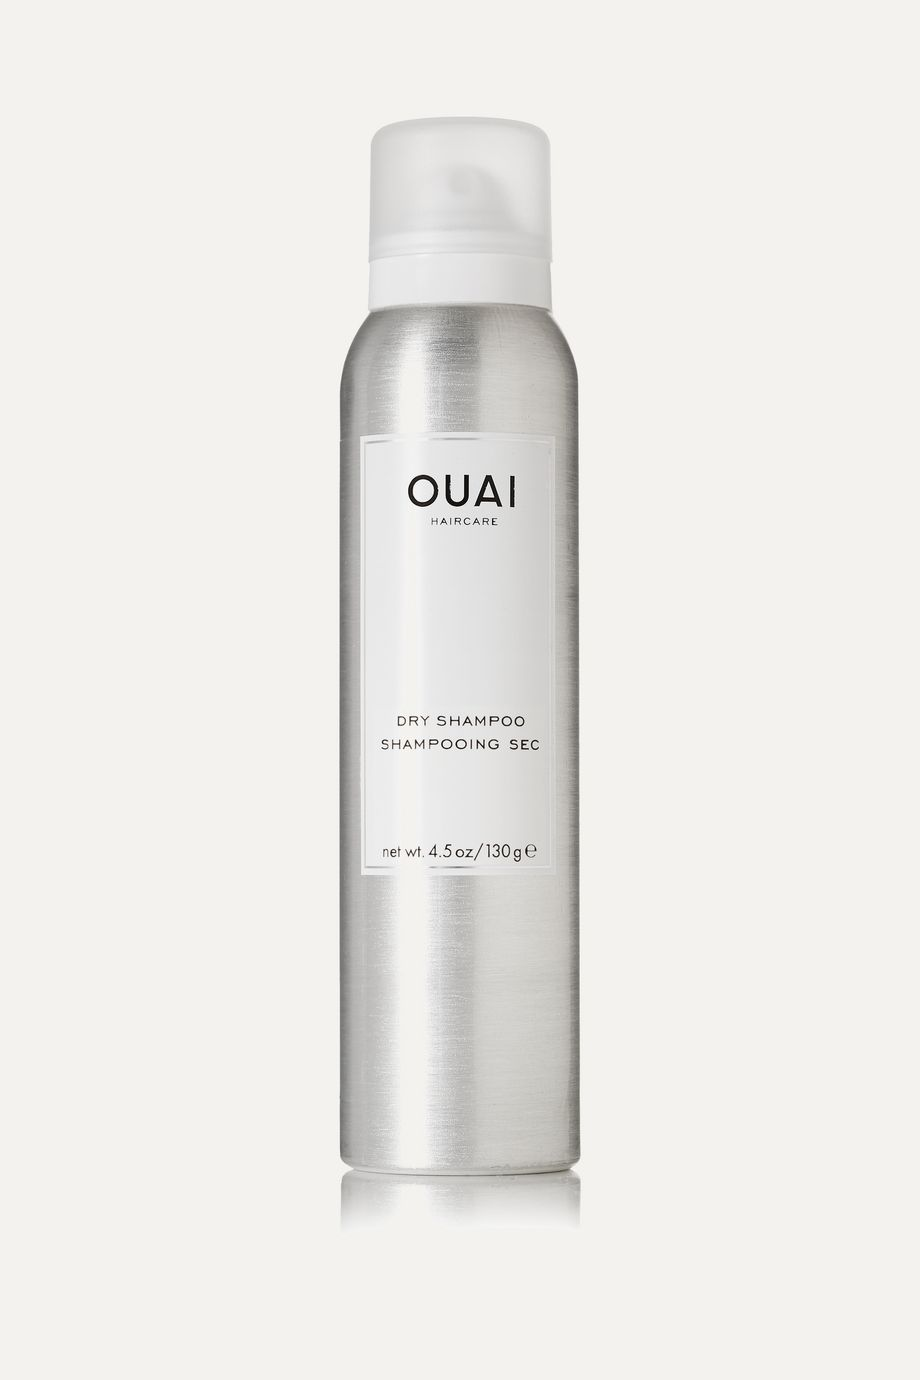 OUAI Haircare Dry Shampoo, 130g